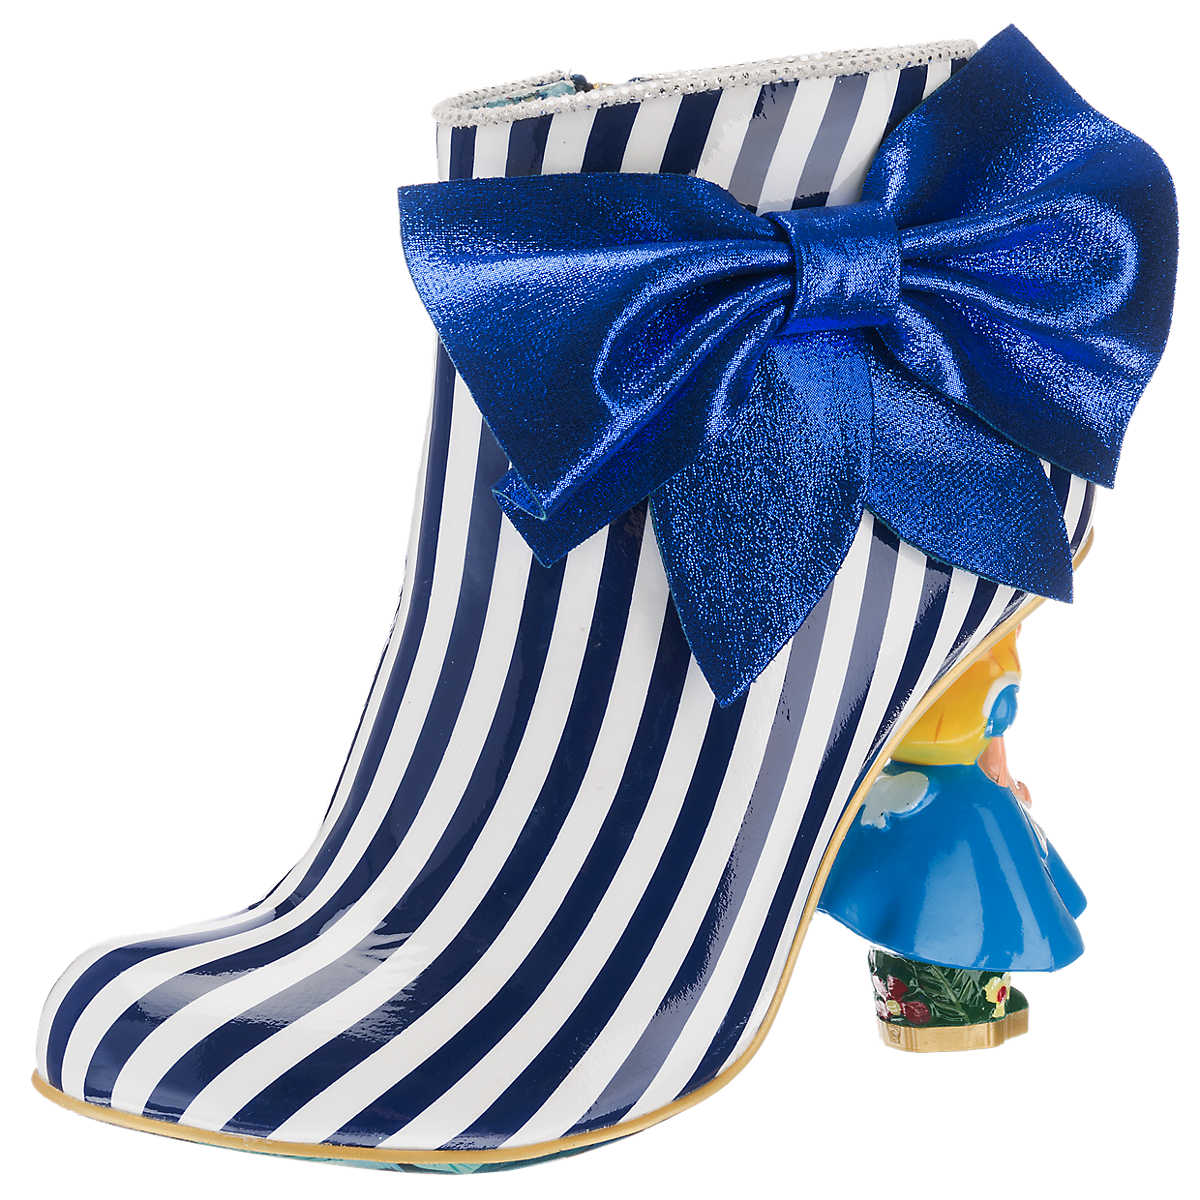 Irregular Choice Who in the World am I? Stiefeletten blau-kombi - Irregular Choice - Stiefeletten - Schuhe - mirapodo.de